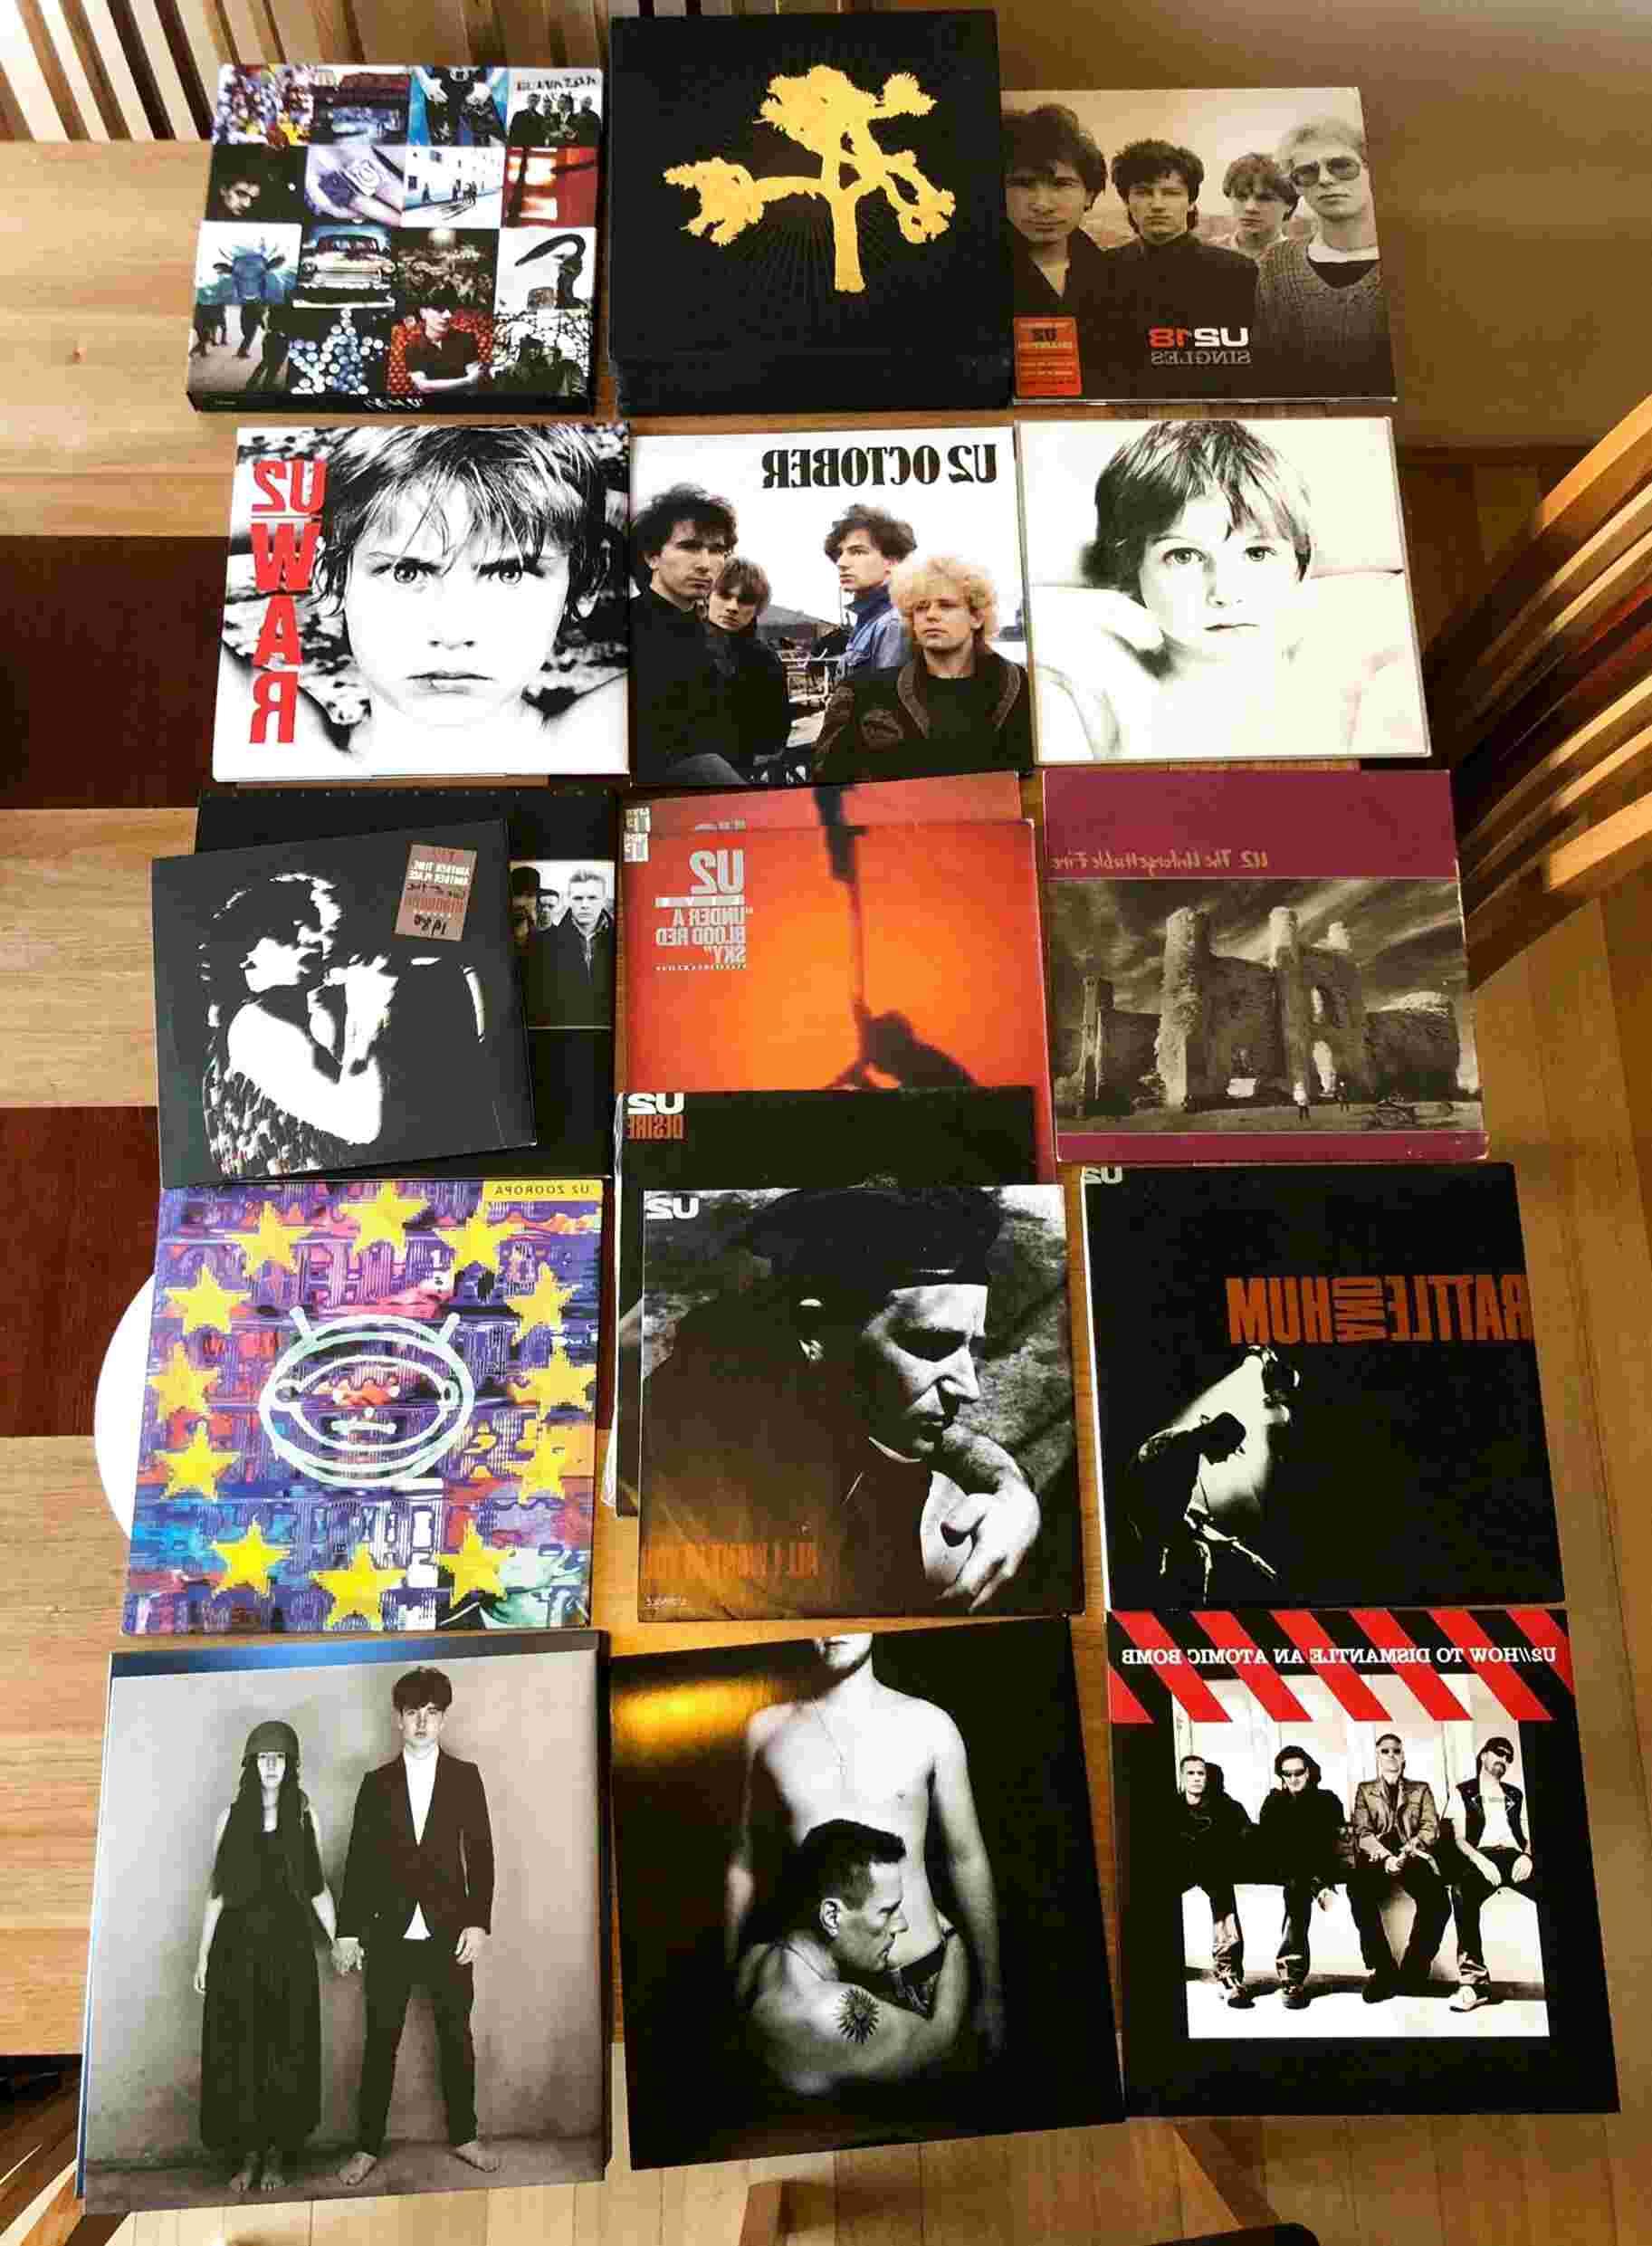 u2 vinyl for sale